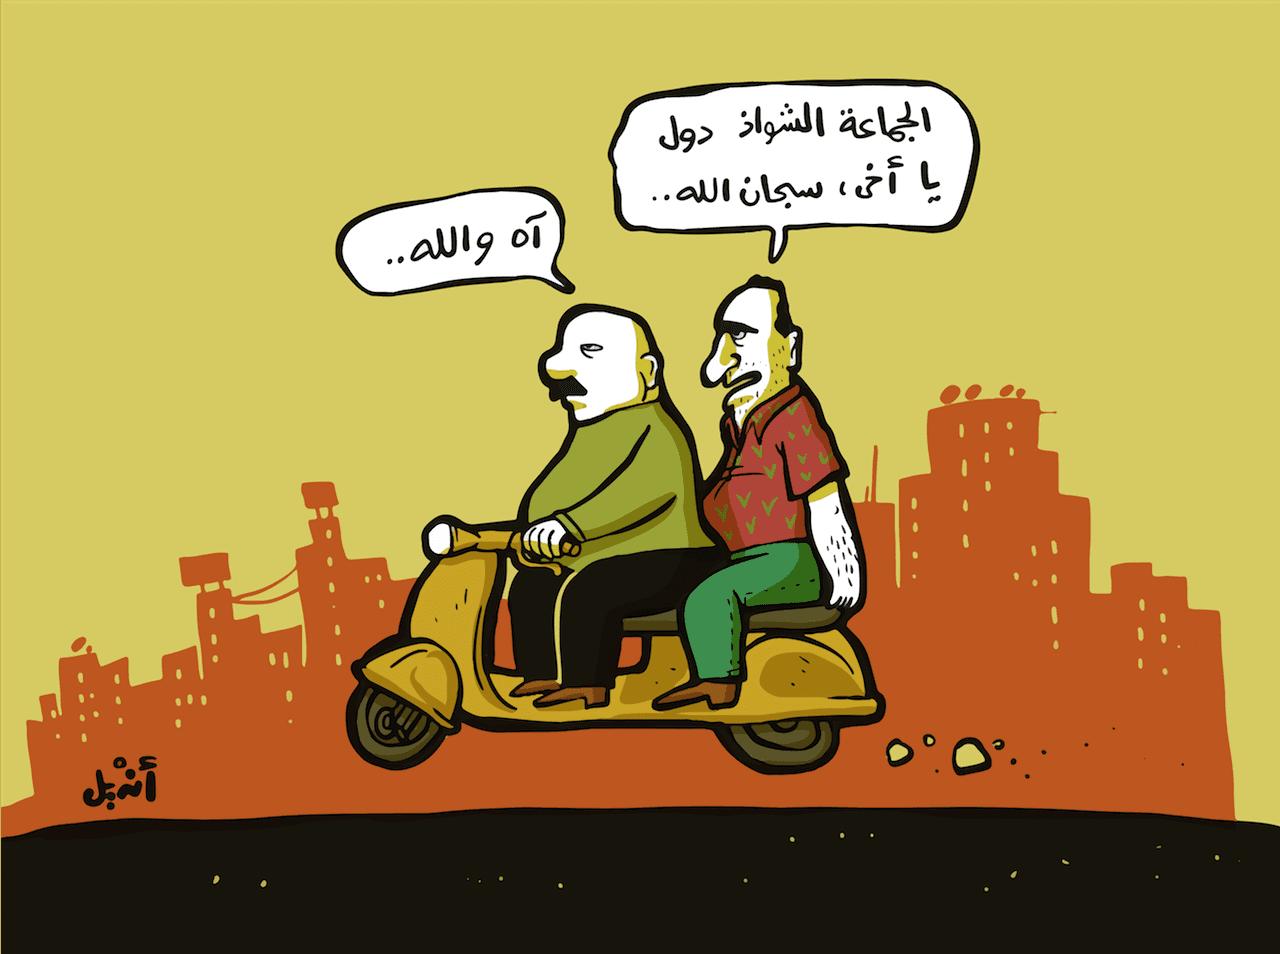 © Andeel, originally published in Mada Masr, 2014